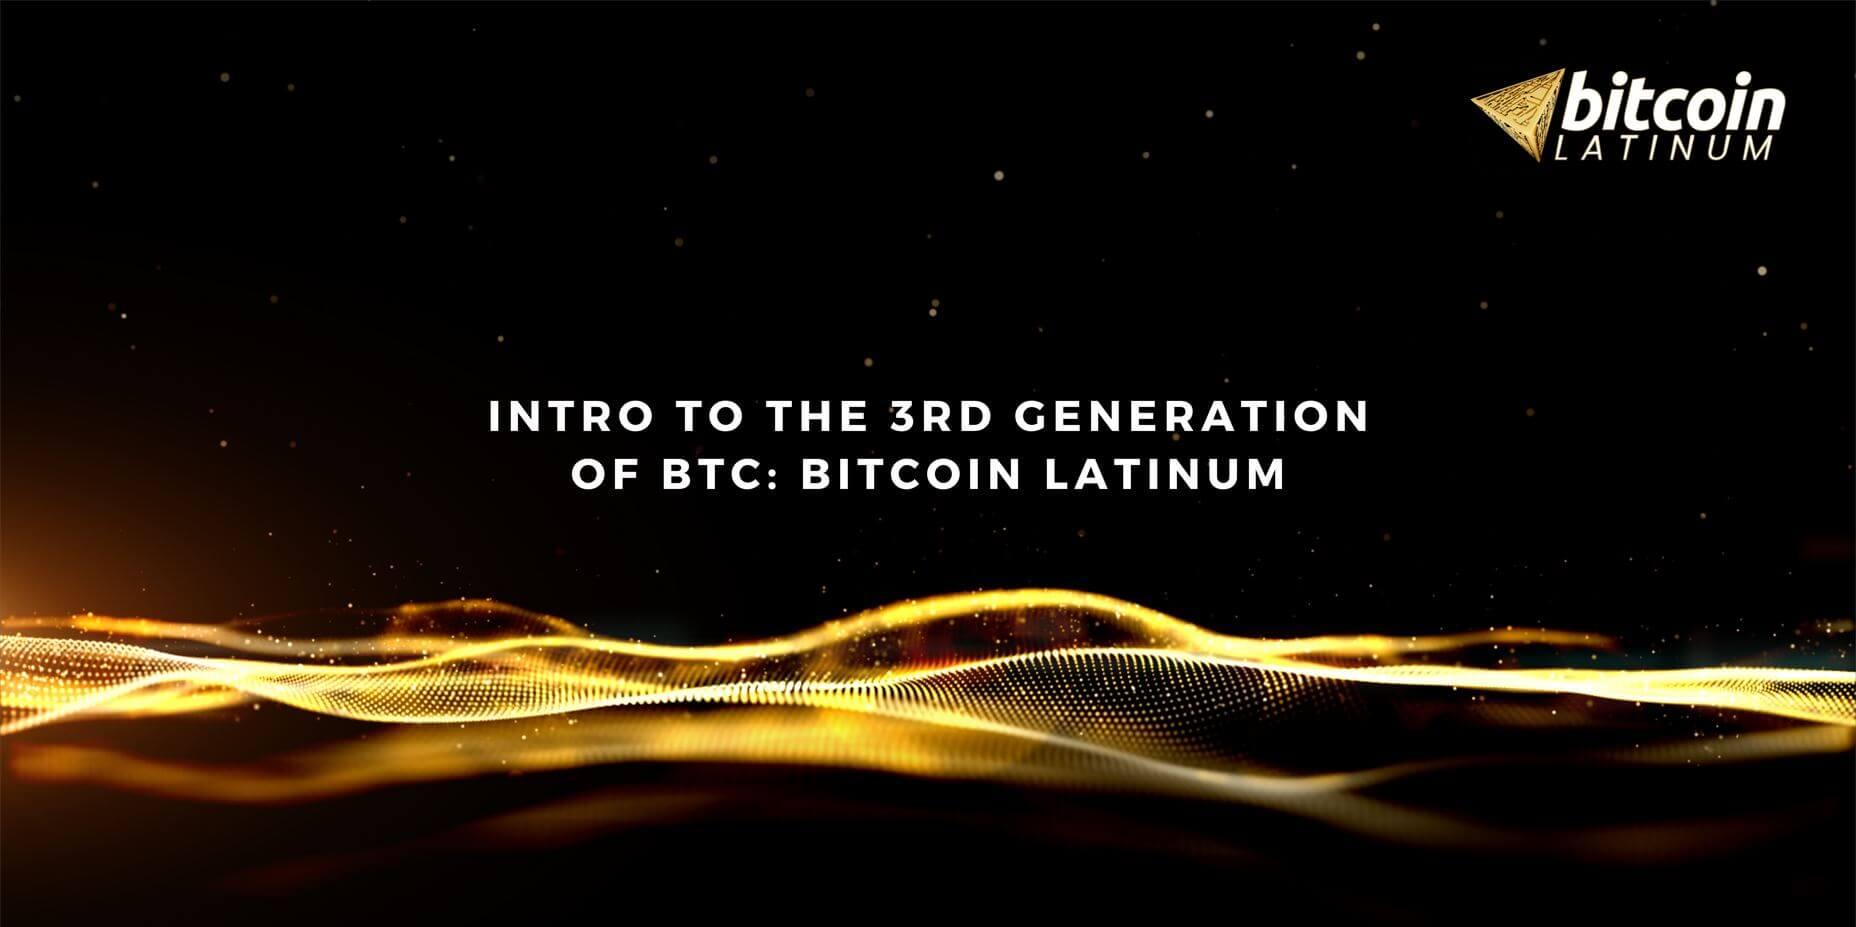 Intro to the 3rd Generation of BTC: Bitcoin Latinum